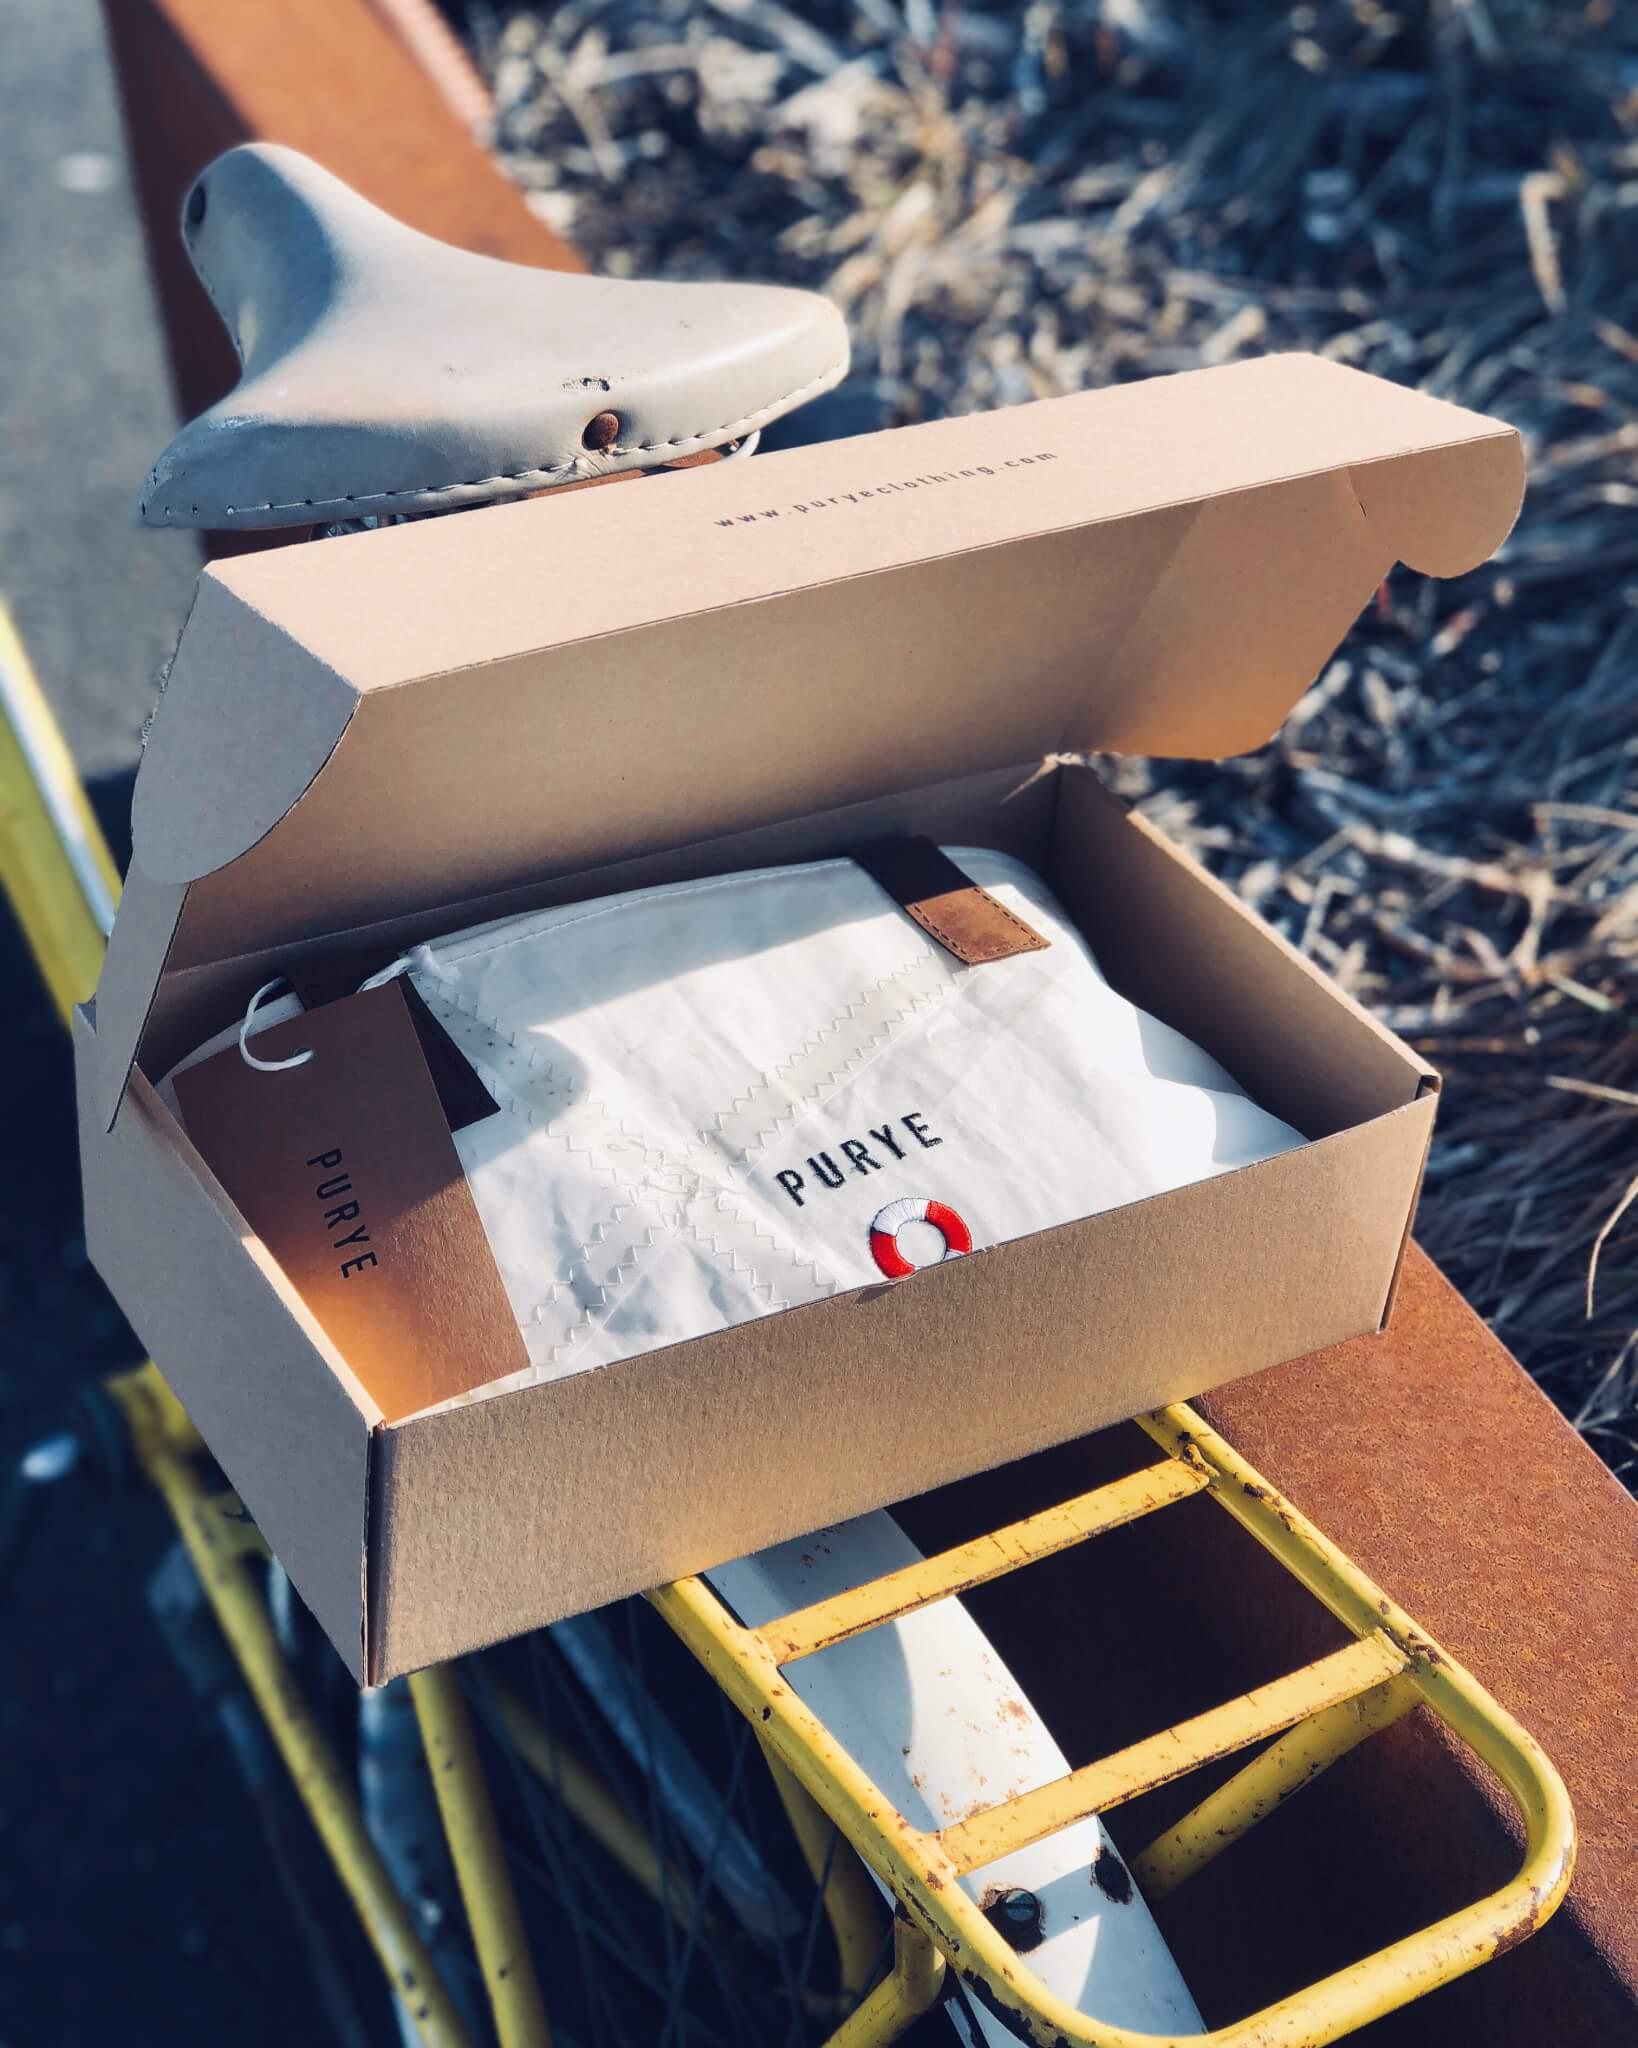 L'emballage de Purye Clothing packhelp